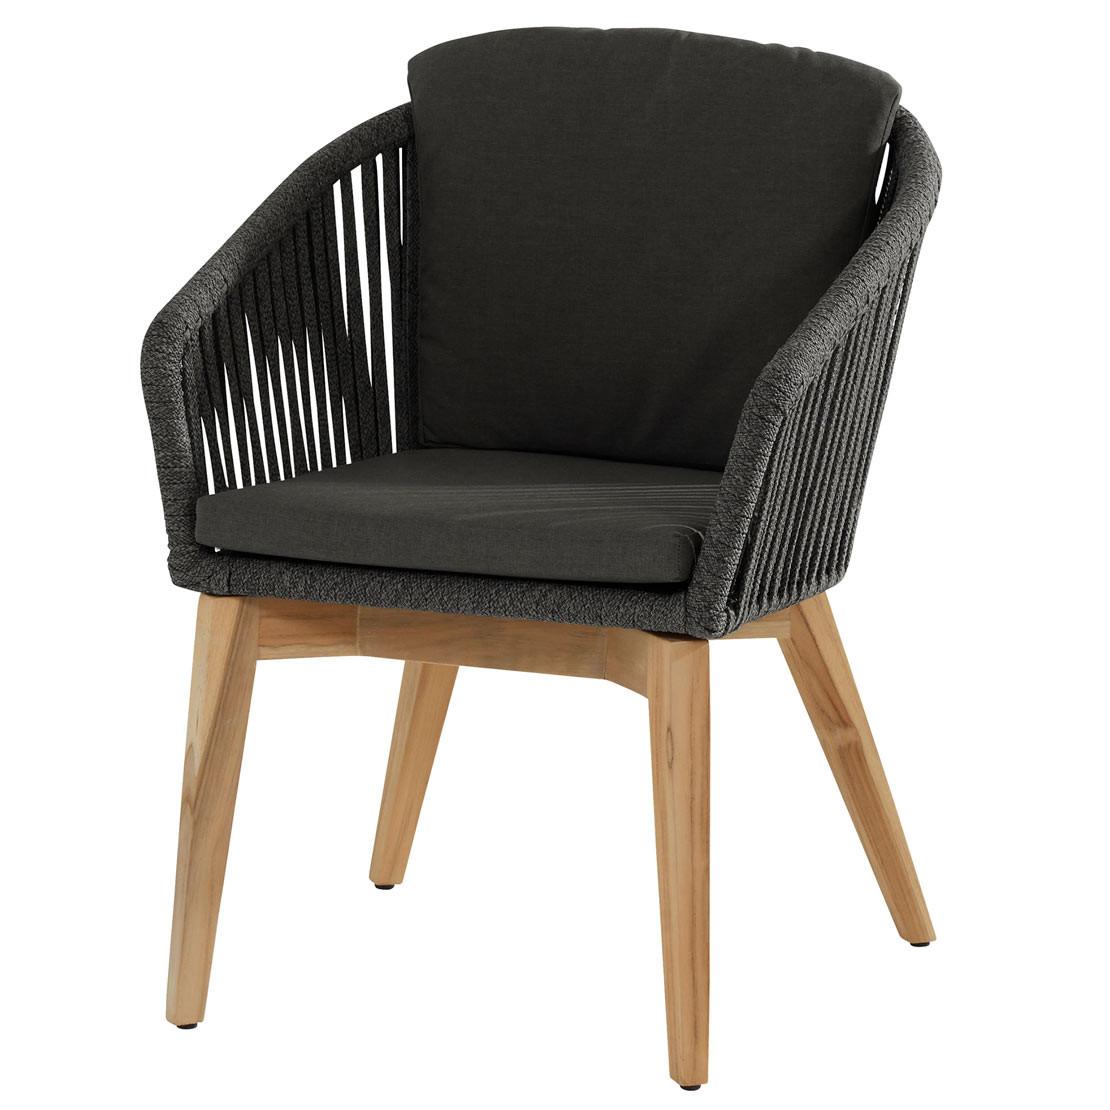 Santander dining chair Teak Black rope with 2 cushions